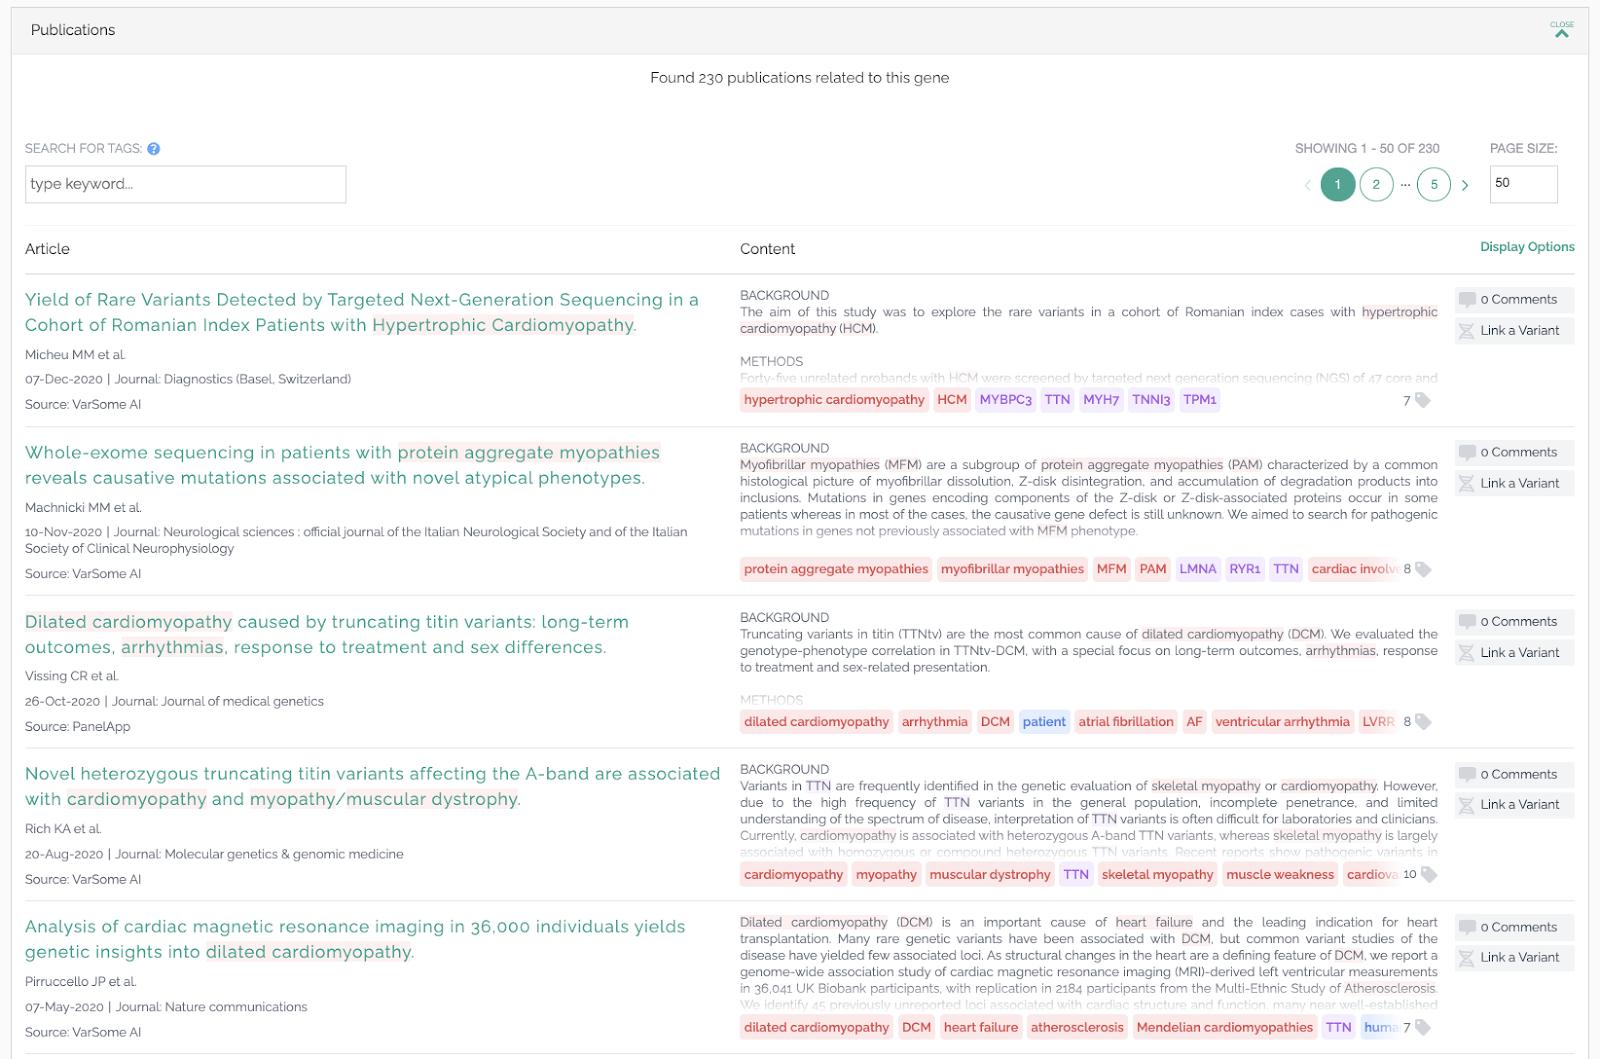 VarSome publication scanning AI